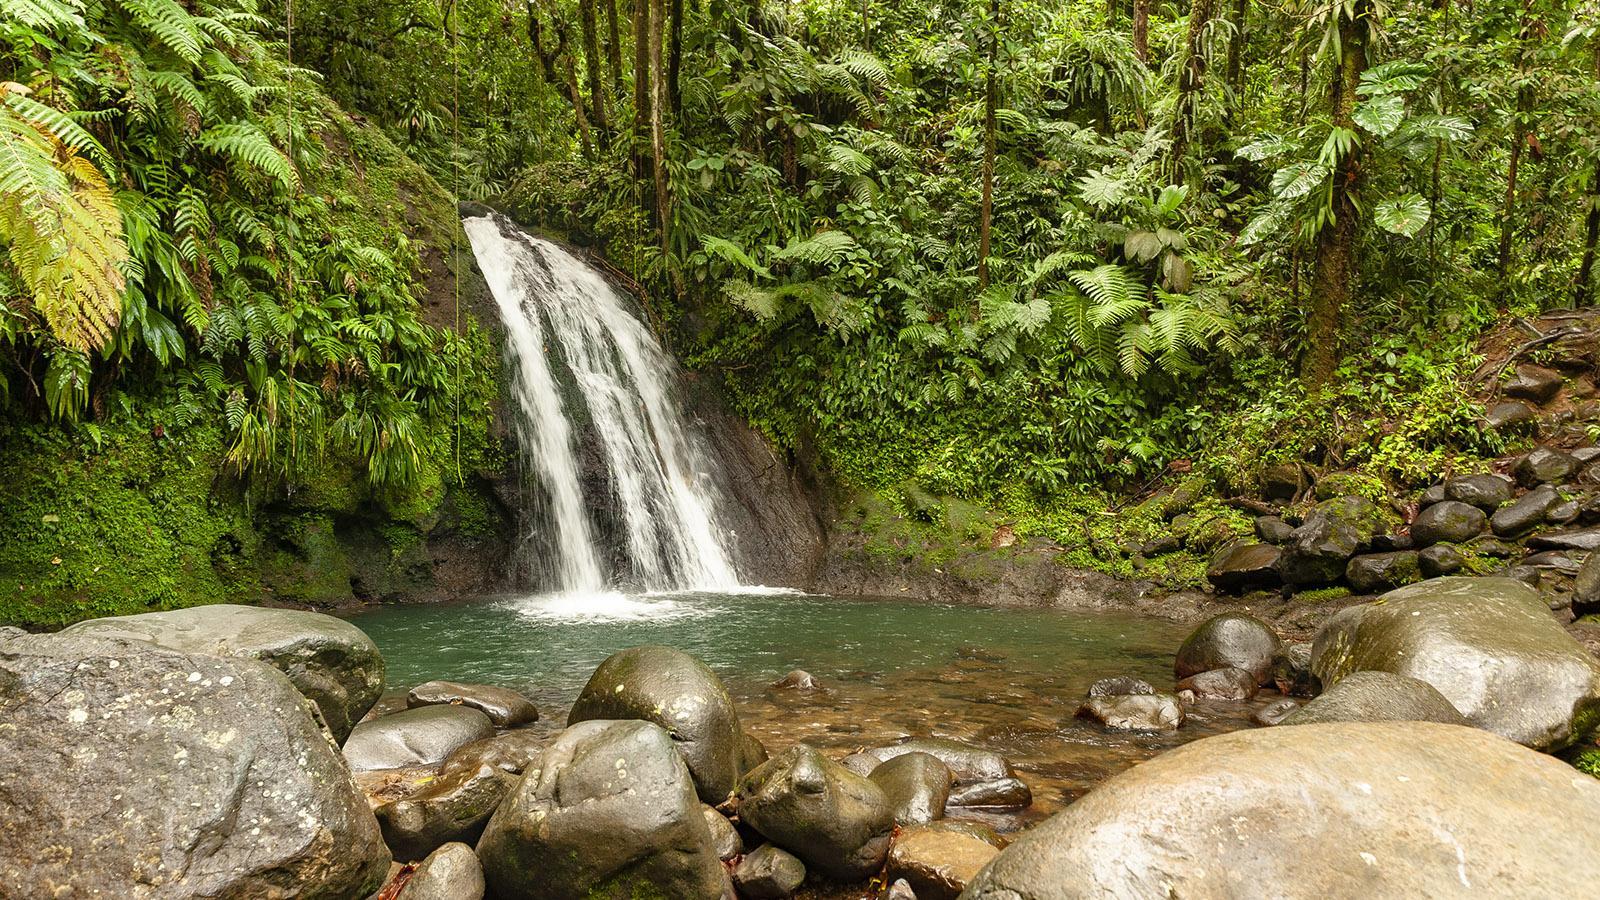 Guadeloupe: der Flusskrebswasserfall im Herzen des Nationalparks. Foto: Hilke Maunder